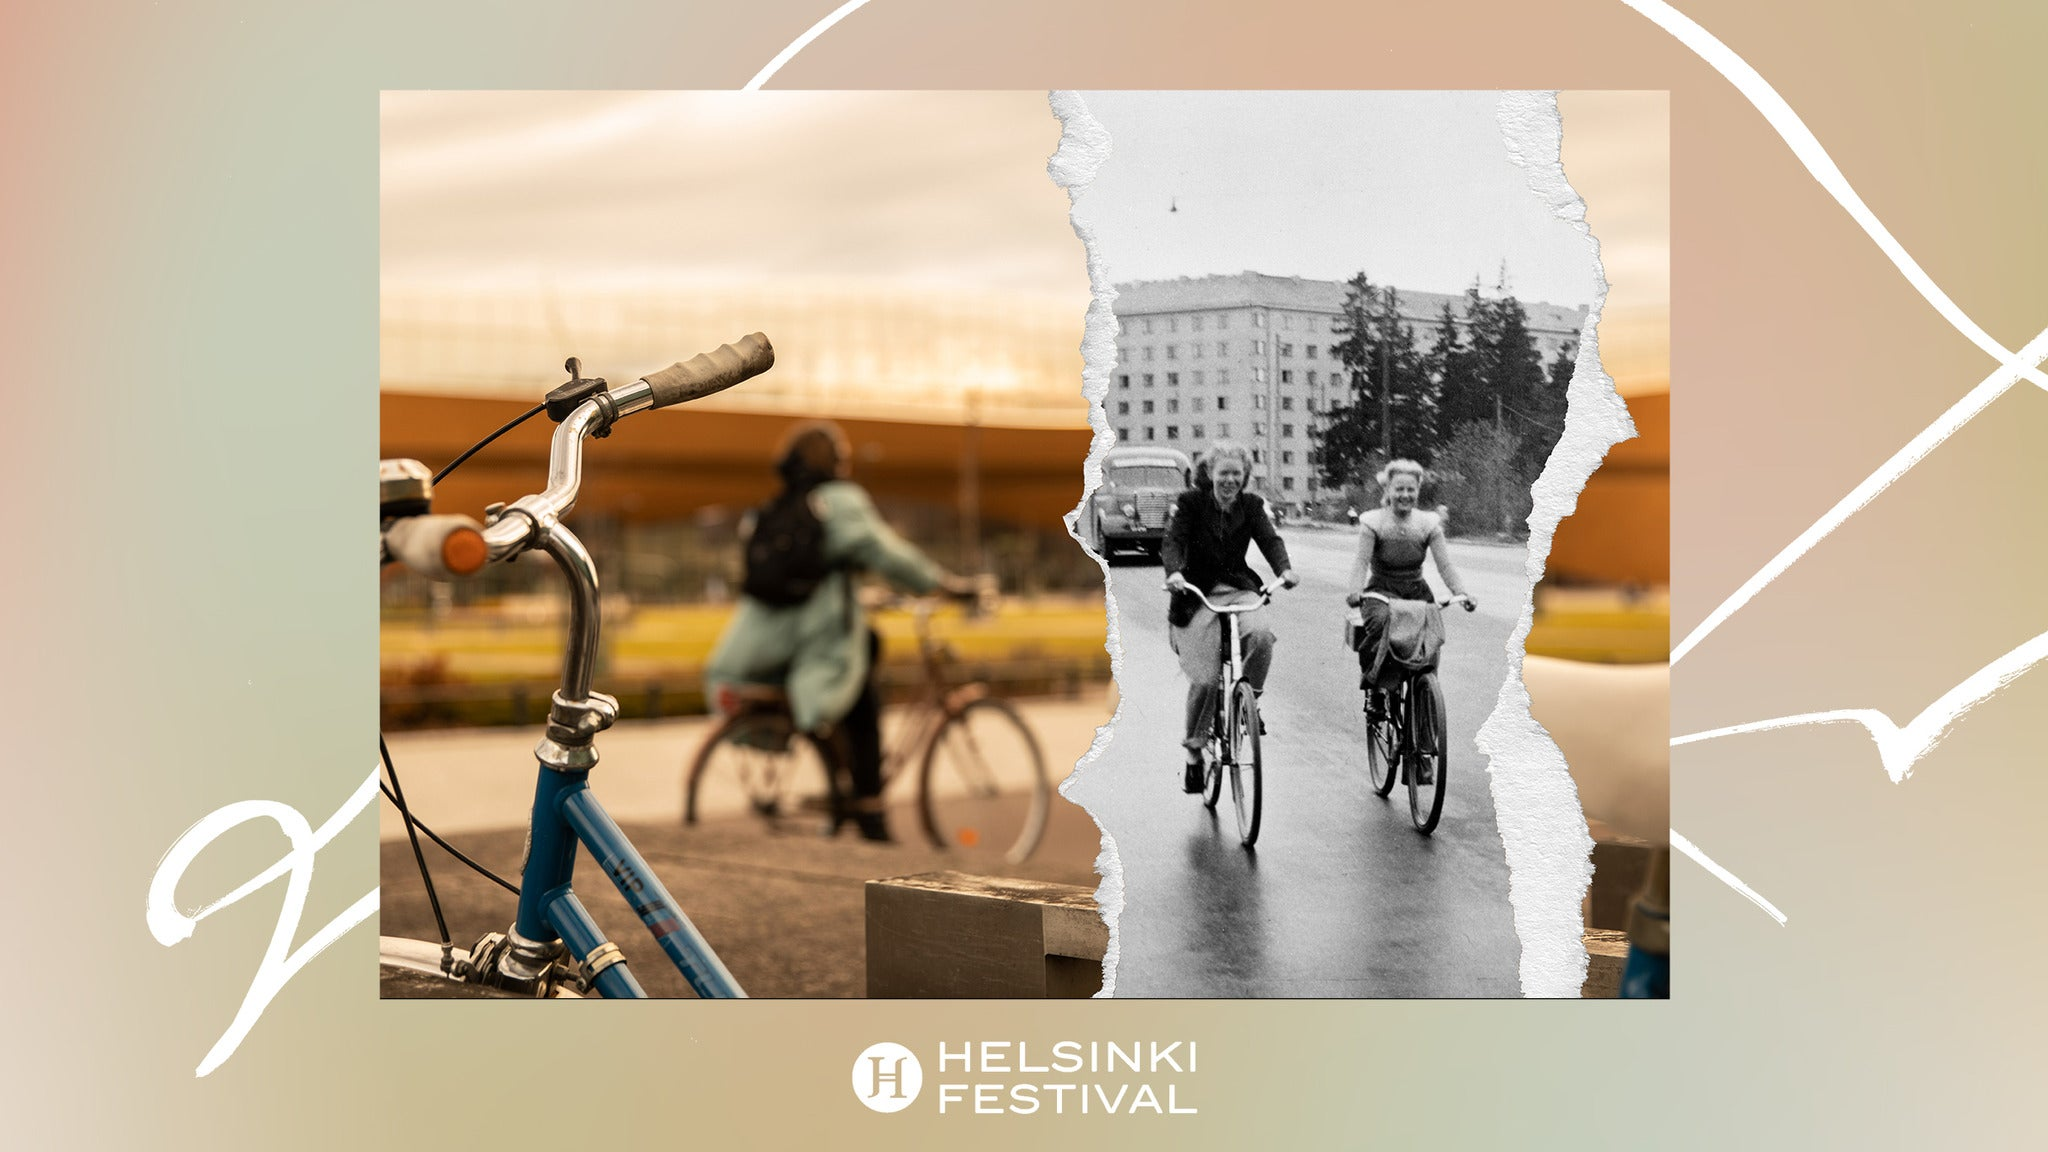 Kira Riikonen – Tuukka Jukola: Cycle City - Body